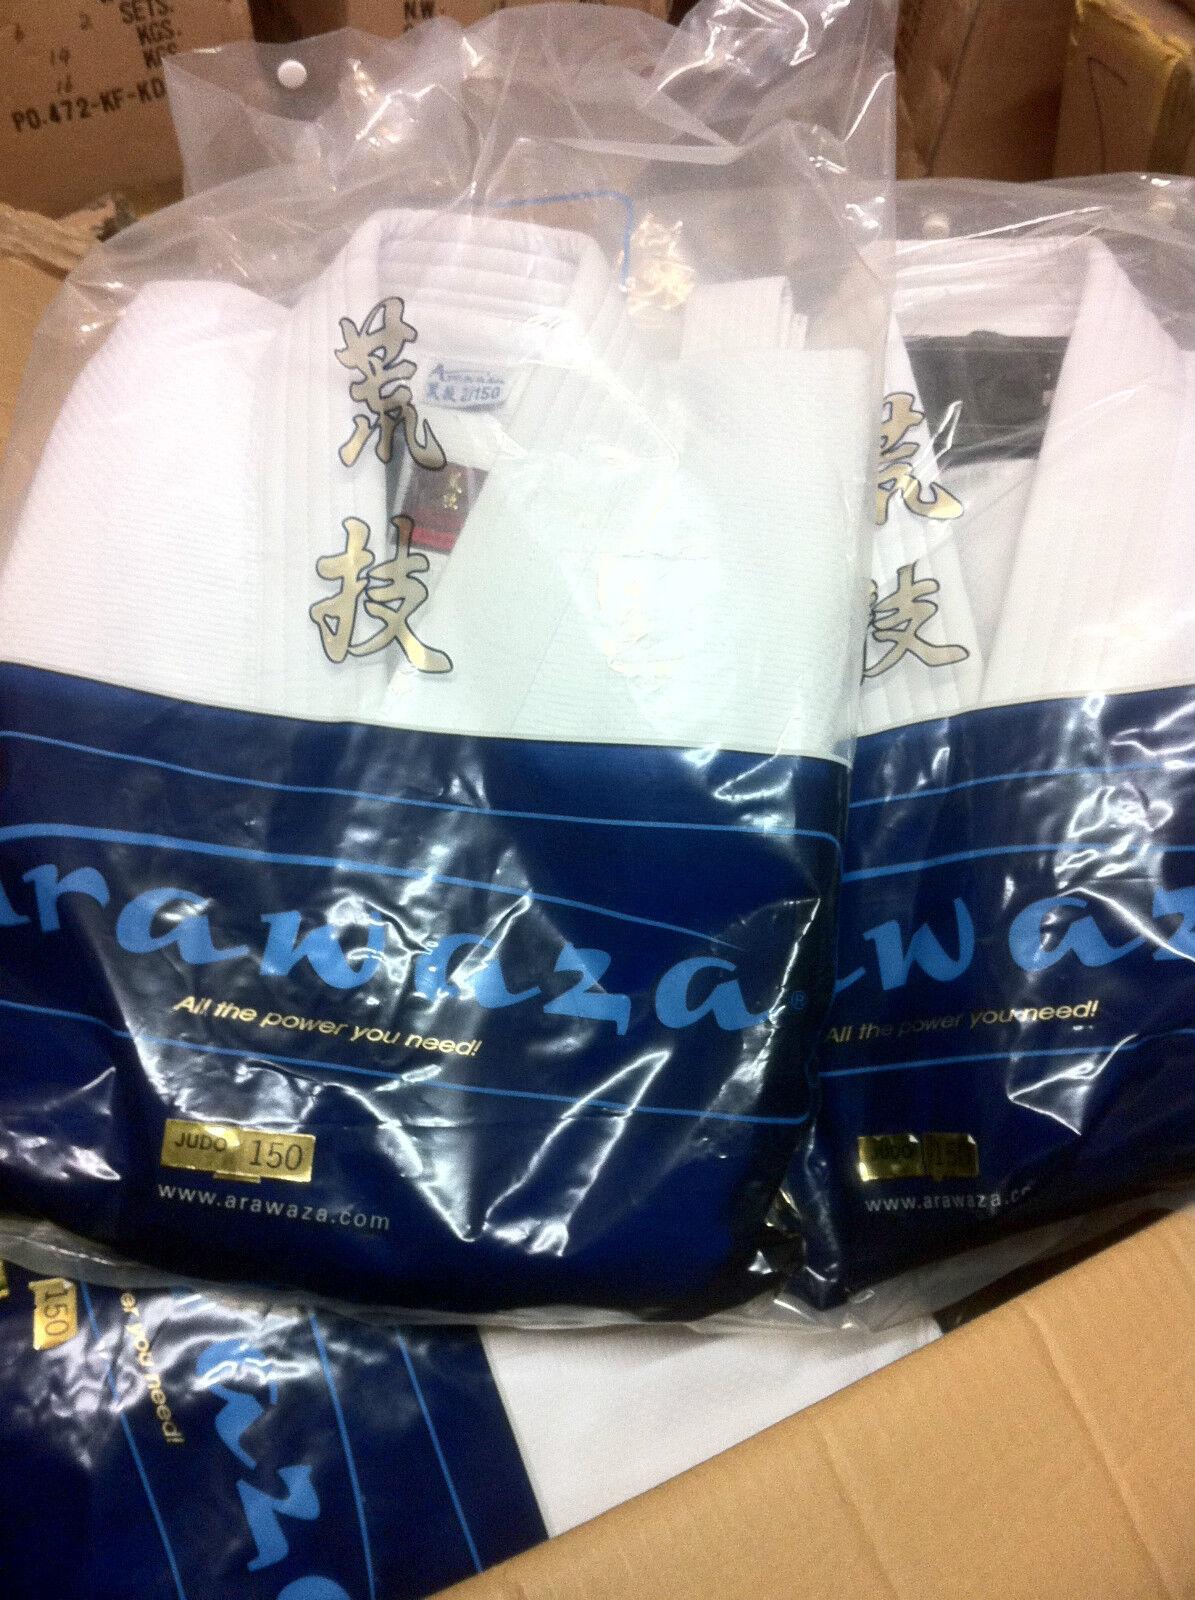 New ARAWAZA CORAL 15oz Top Quality JUDO SUIT GI Uniform Martial Arts - 9 Sizes